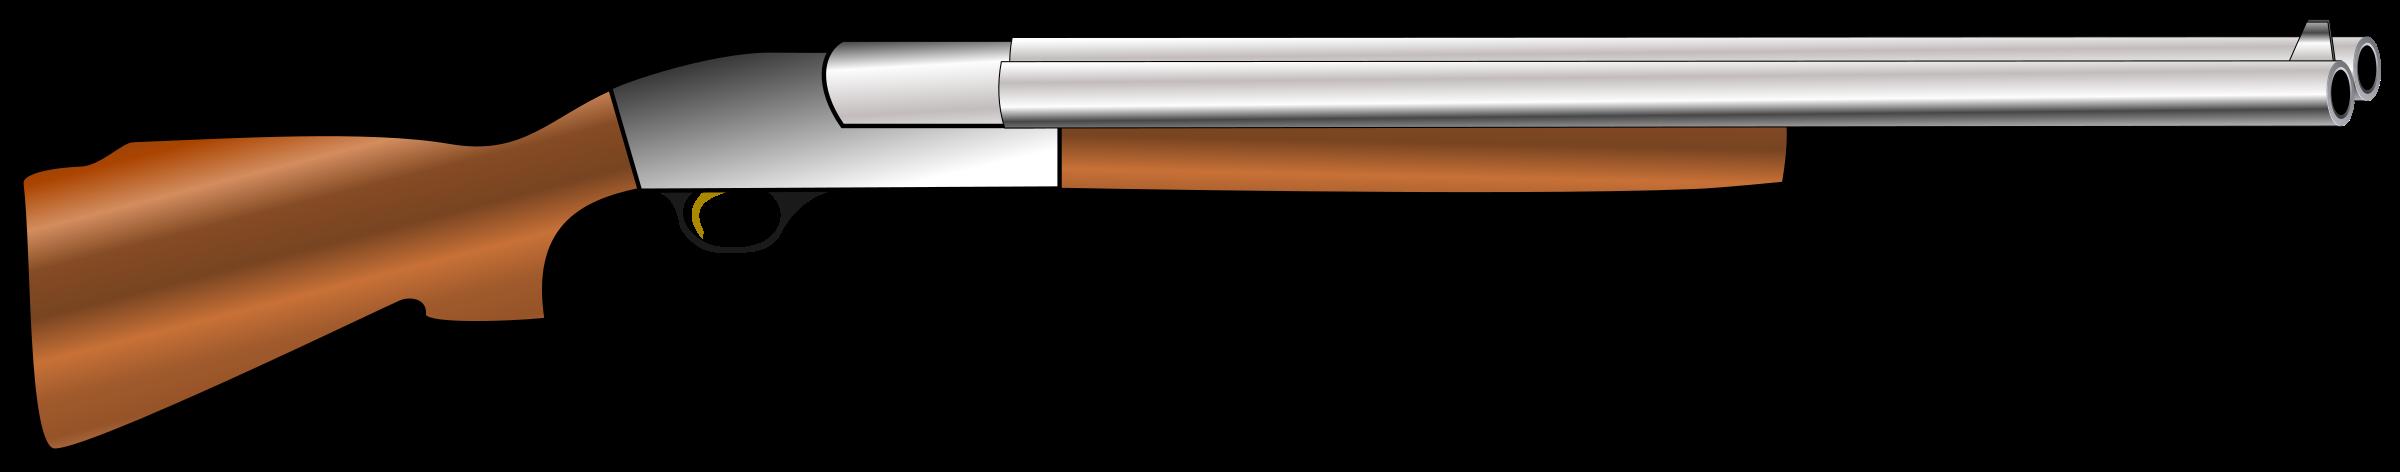 Clipart gun hunting gun. Rifle big image png